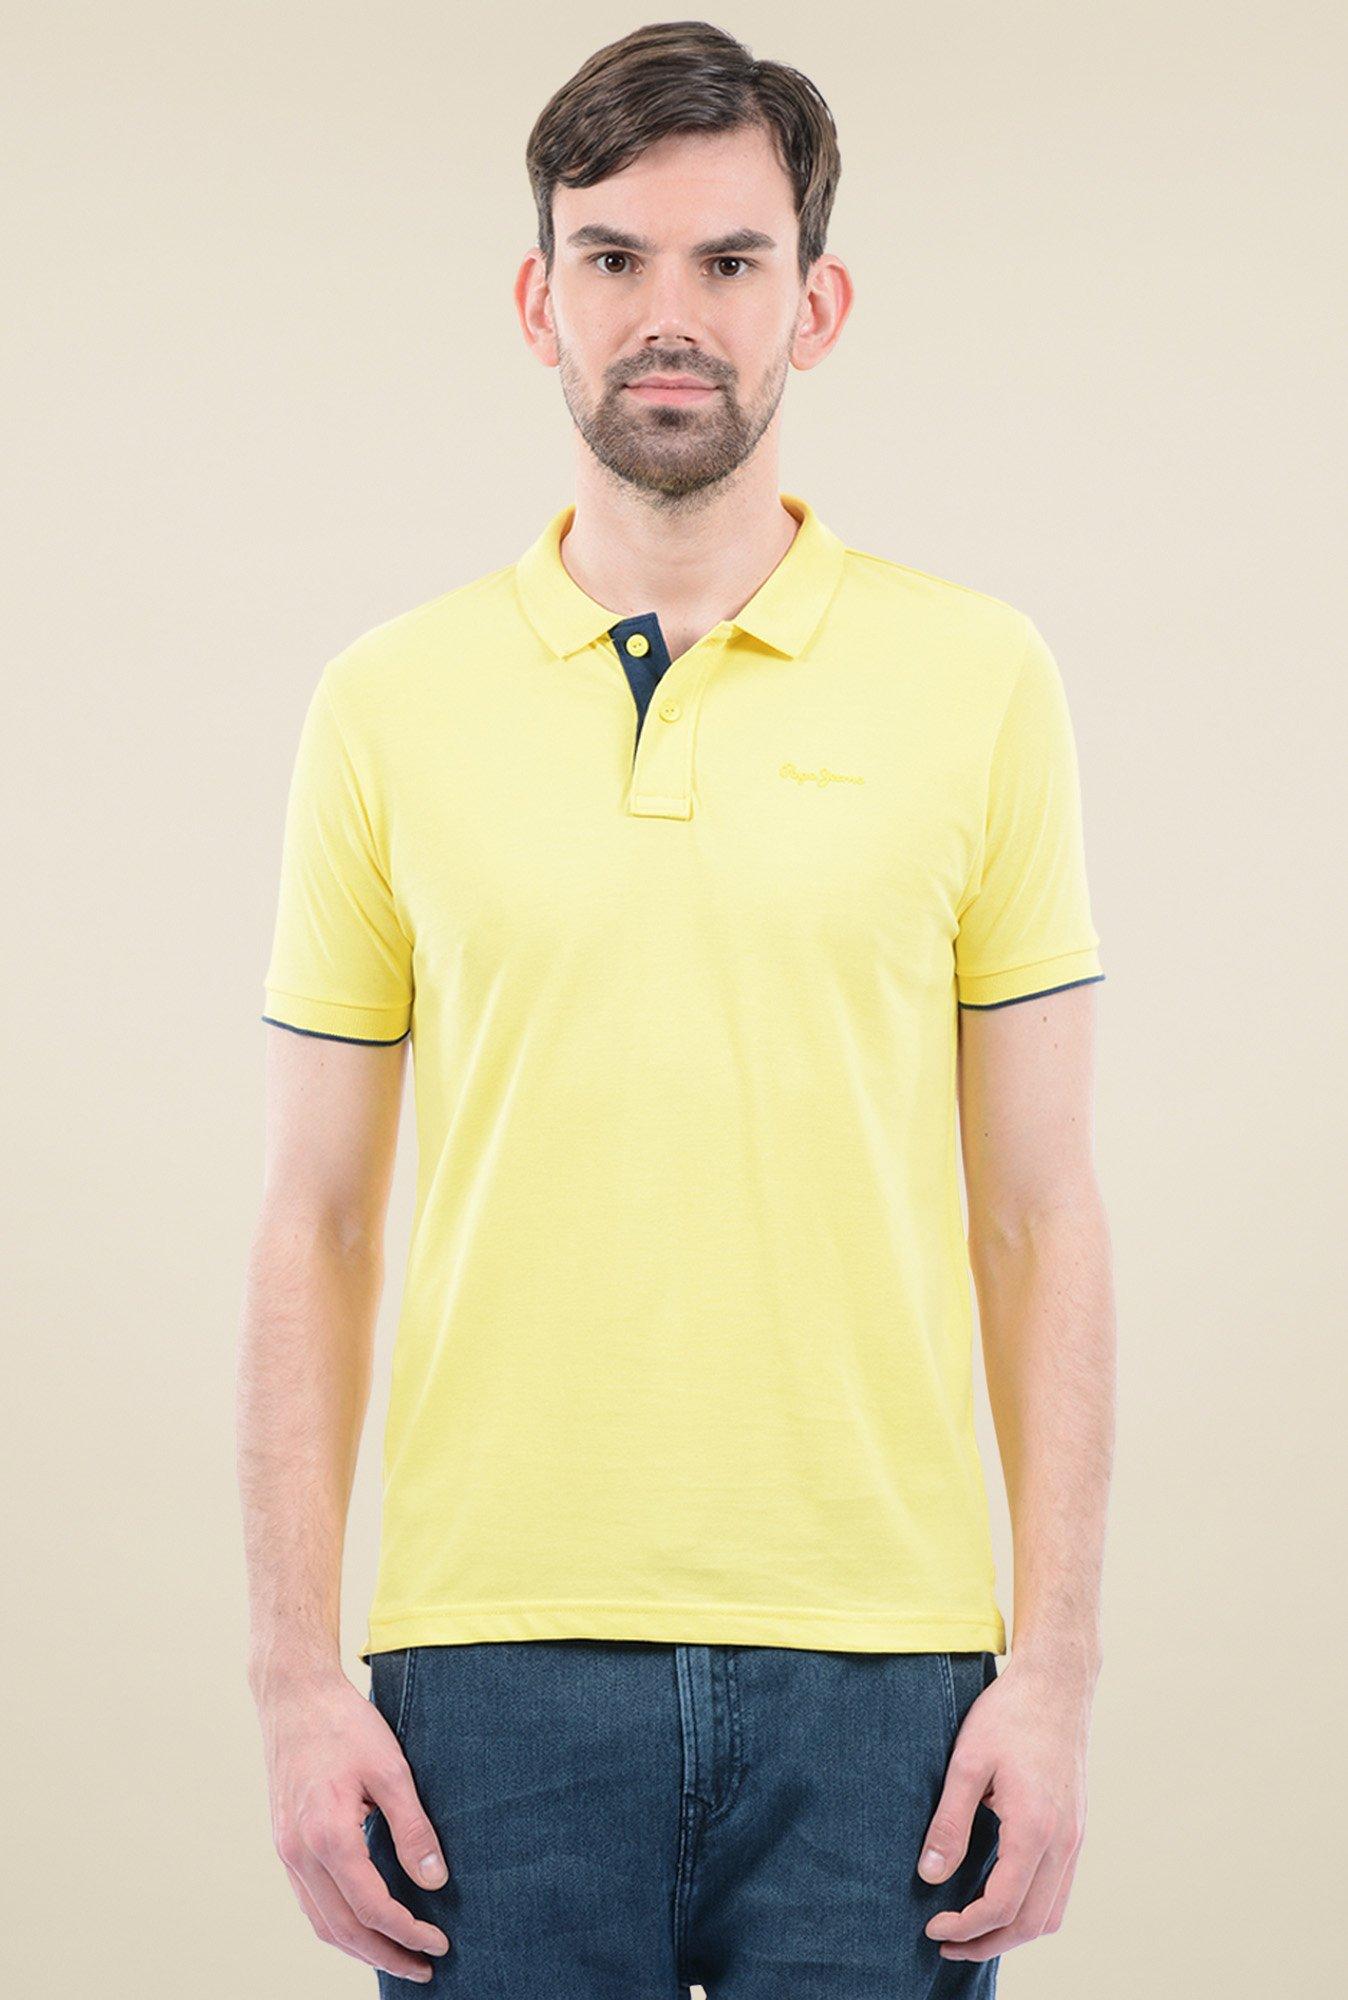 35516b9c8 Buy Pepe Jeans Yellow Cotton Polo T-Shirt for Men Online @ Tata CLiQ